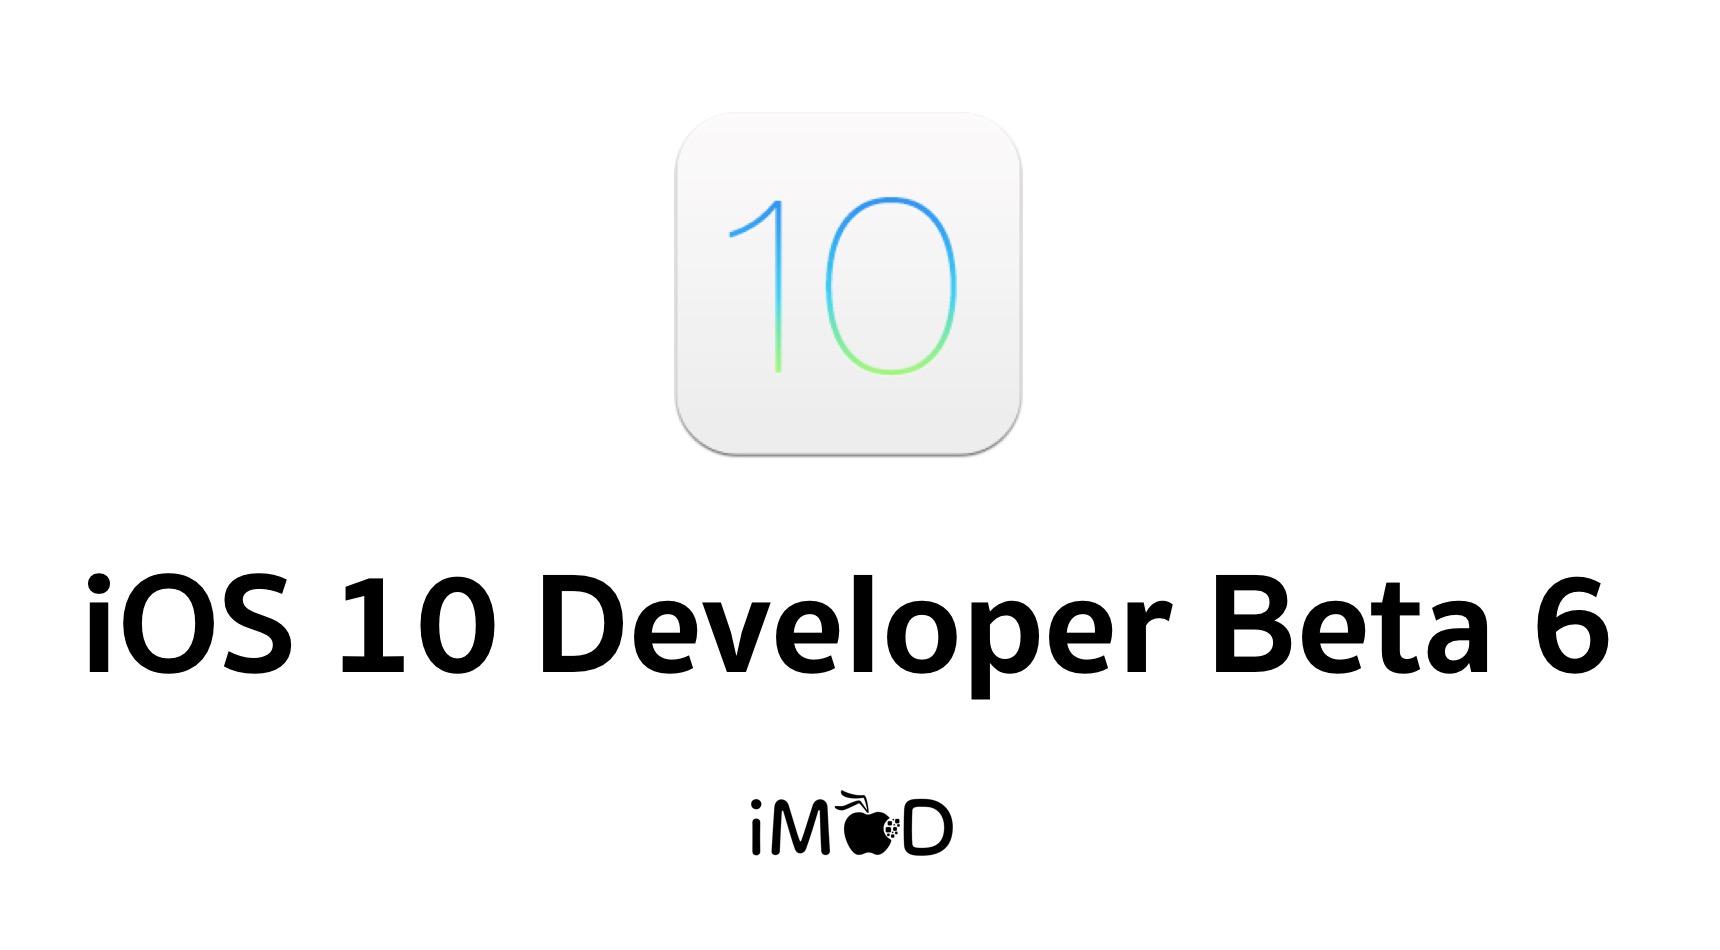 Apple ปล่อย iOS 10 Developer Beta 6/Public Beta 5 ให้ทดสอบแล้ว